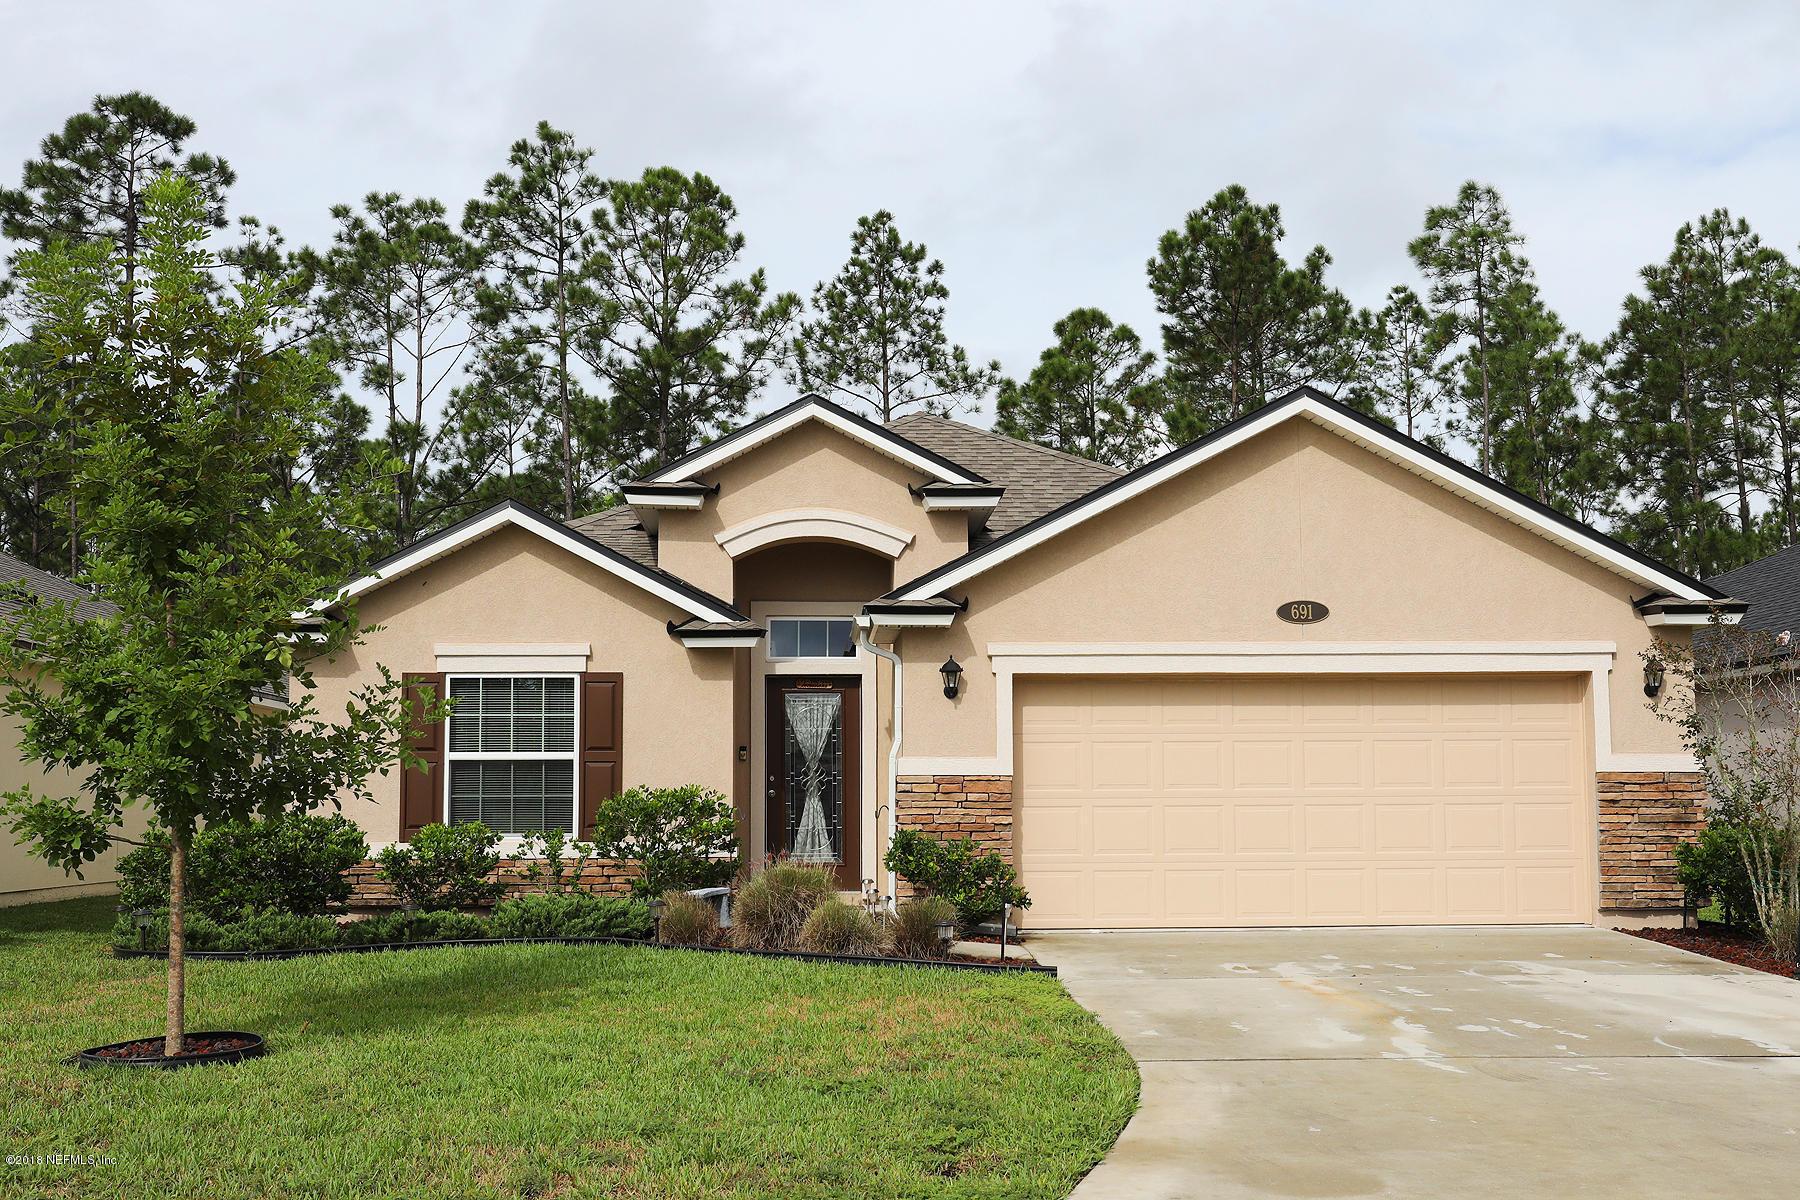 691 GLENDALE, ORANGE PARK, FLORIDA 32065, 4 Bedrooms Bedrooms, ,2 BathroomsBathrooms,Residential - single family,For sale,GLENDALE,963865